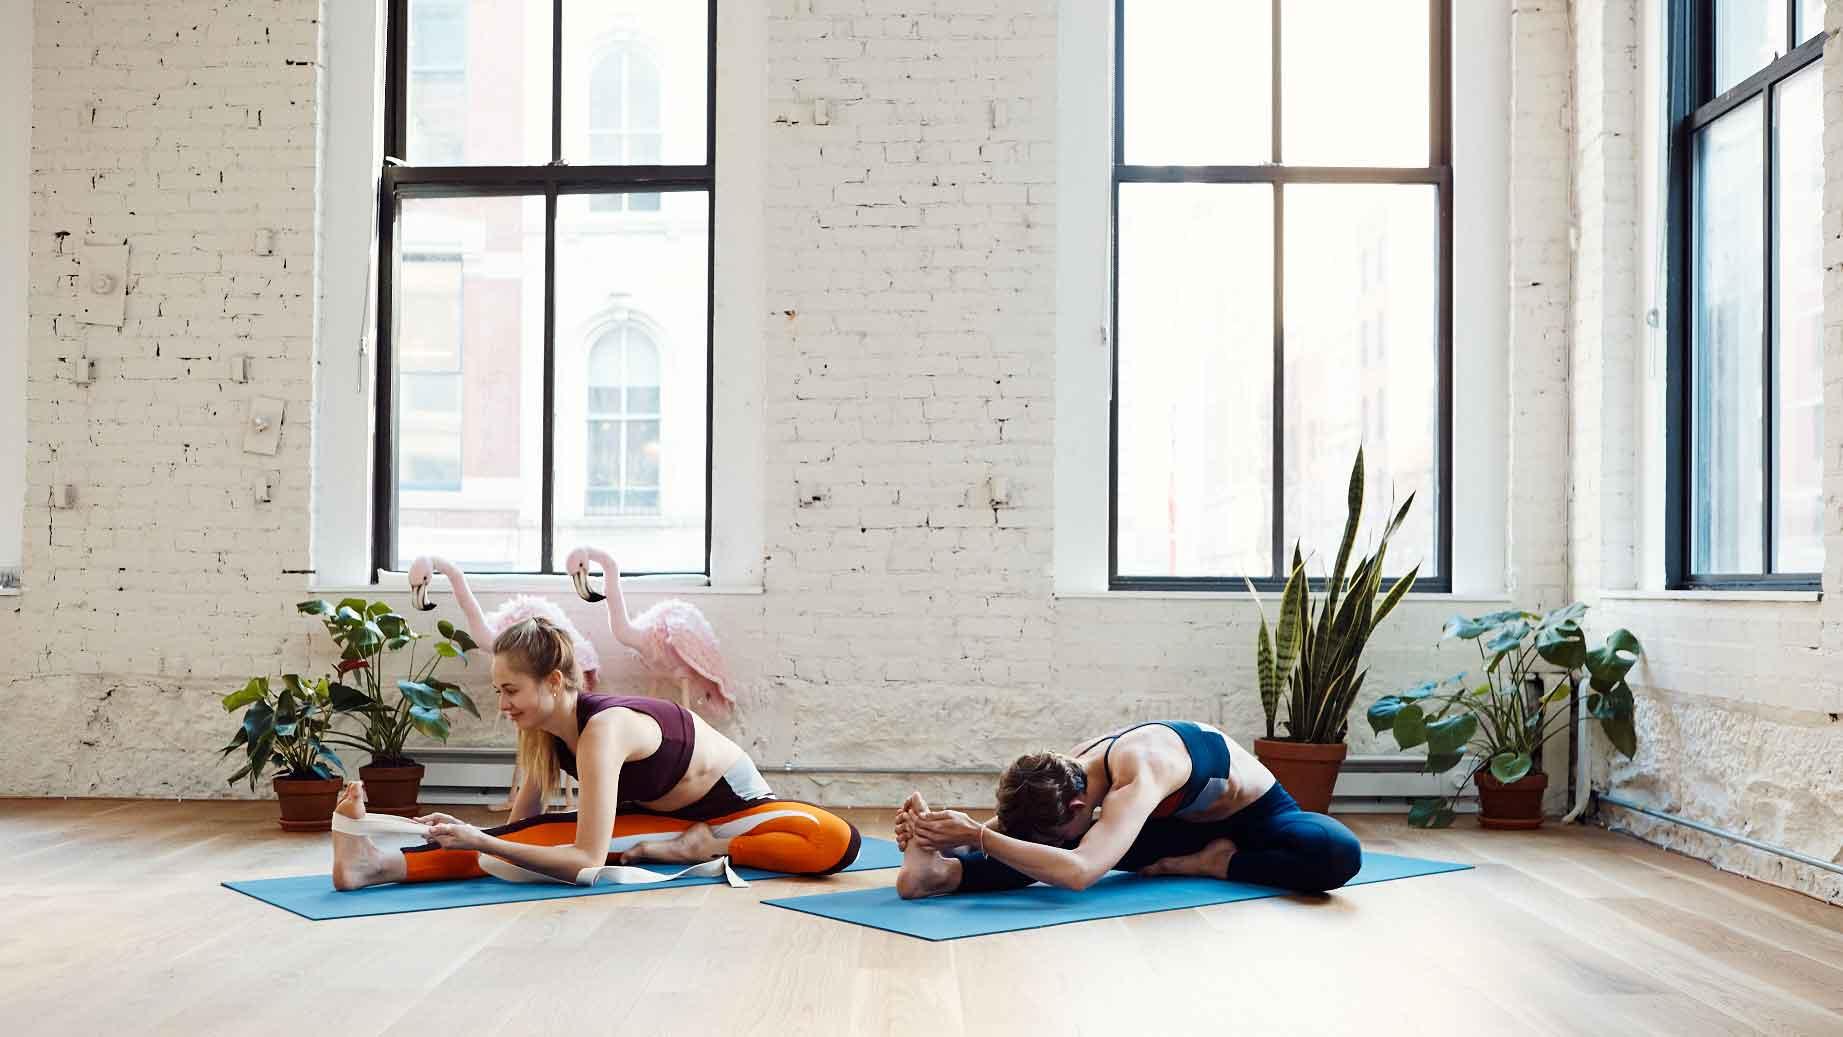 Contrapreneur — Yoga Business With Sky Ting Yoga Founders, Krissy Jones & Chloe Kernaghan